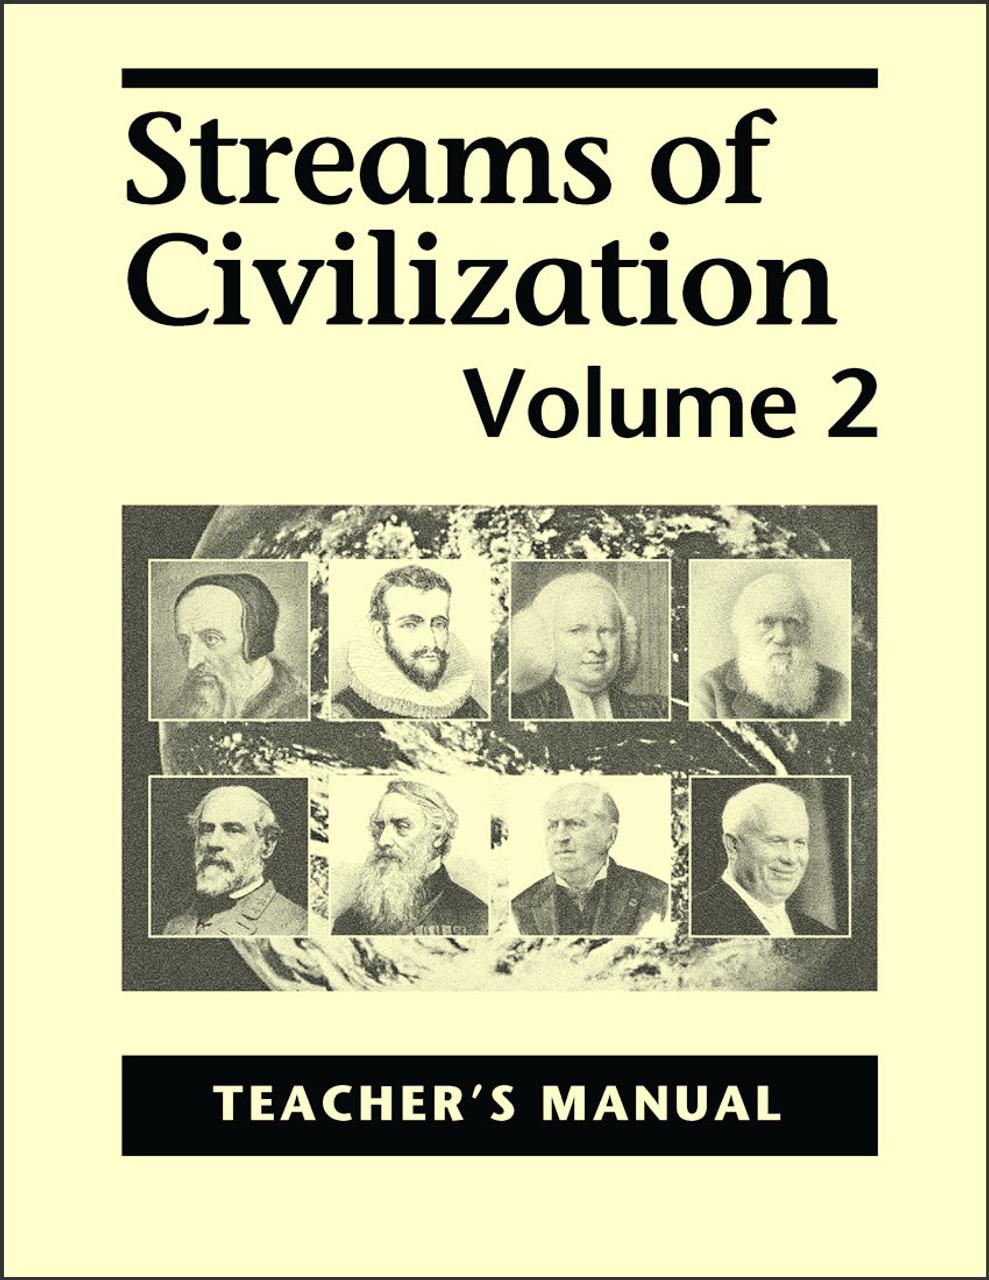 Streams of Civilization Volume 2, 2nd edition - Teacher's Manual